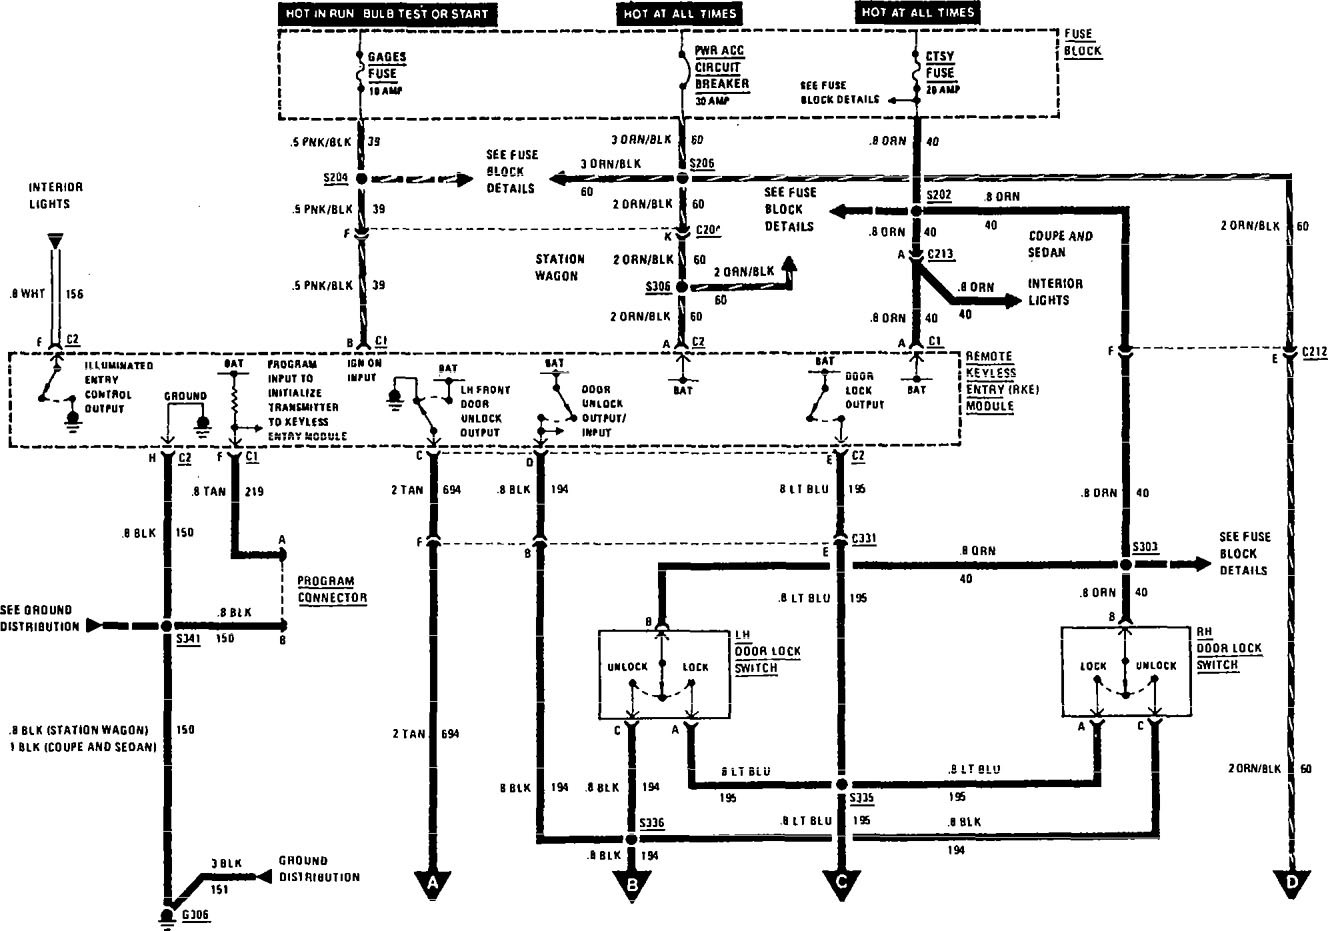 wiring diagram for hyundai getz stereo